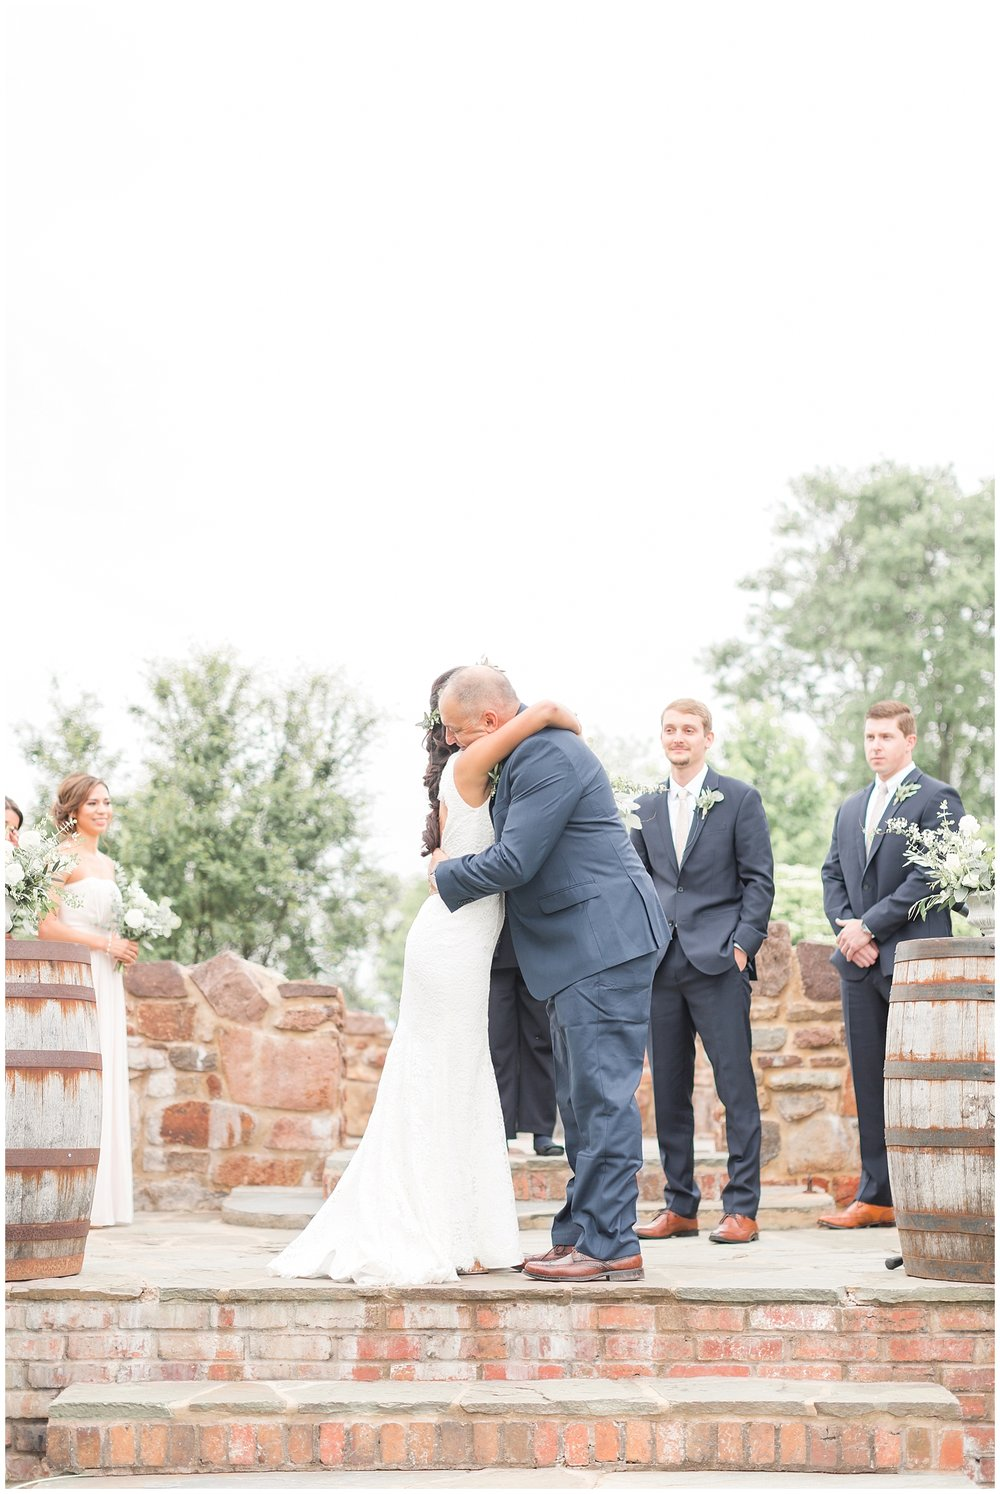 Manassas-Virginia-Wedding-Photos_Winery-at-Bull-Run-Wedding_Jessica-Green-Photography-38.jpg